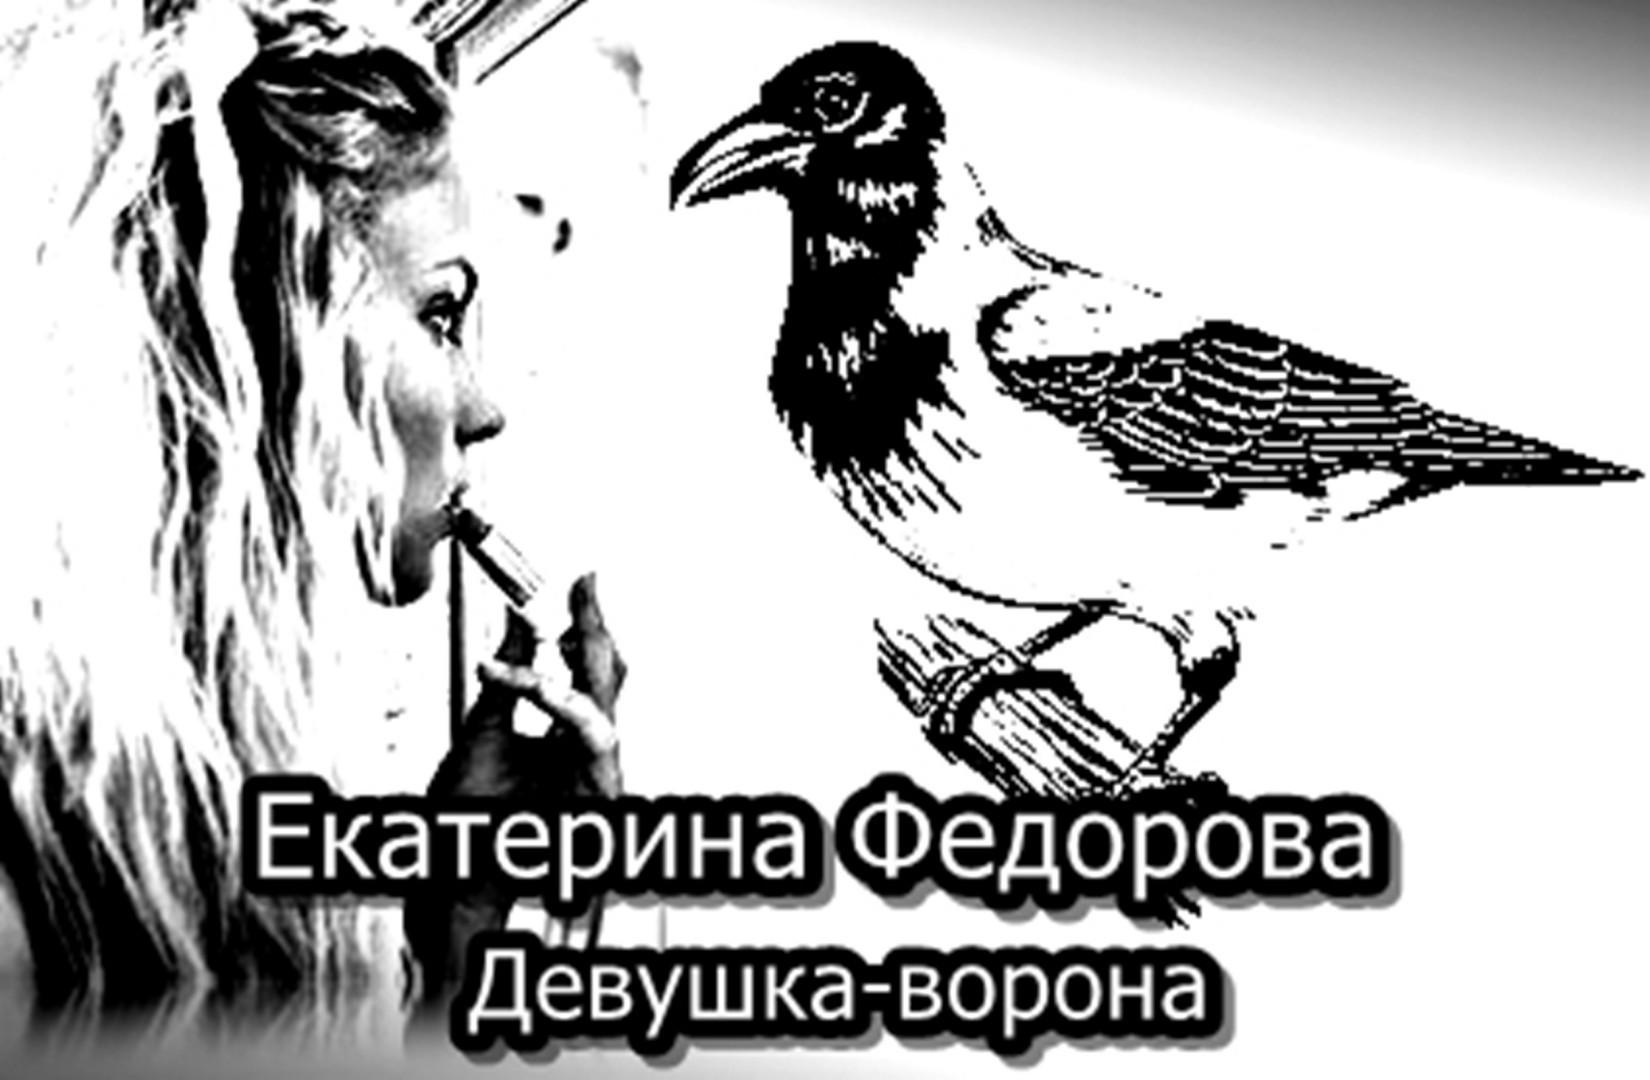 Екатерина Владимировна Федорова. Девушка-ворона